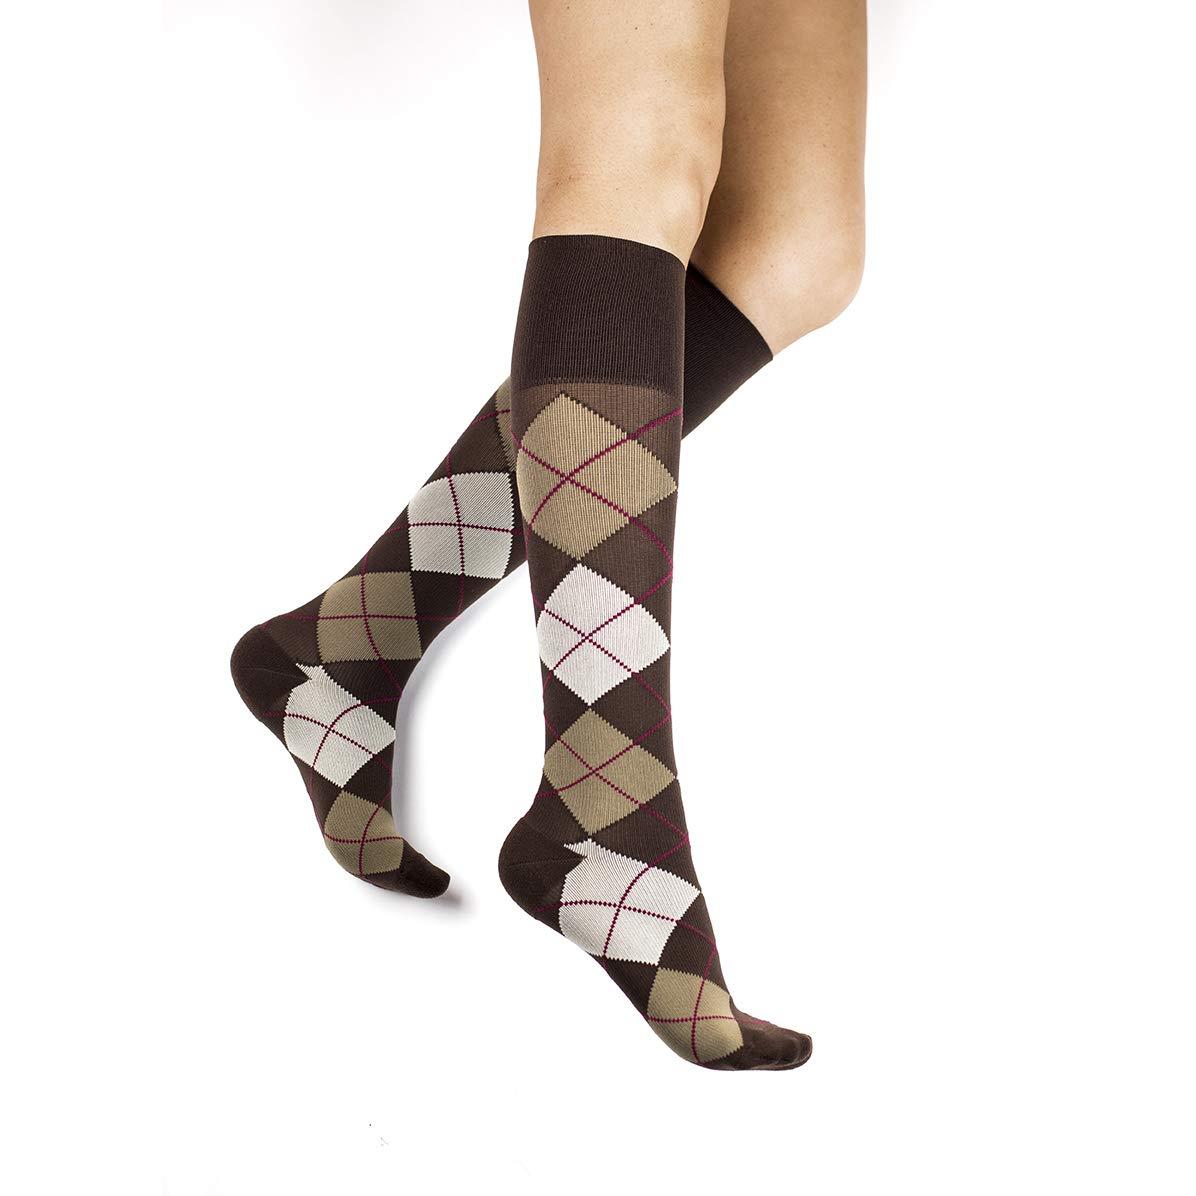 RejuvaHealth Compression Knee High, Unisex Sock Argyle-Chestnut, 20-30 mmHg by RejuvaHealth KARG2030X-CH